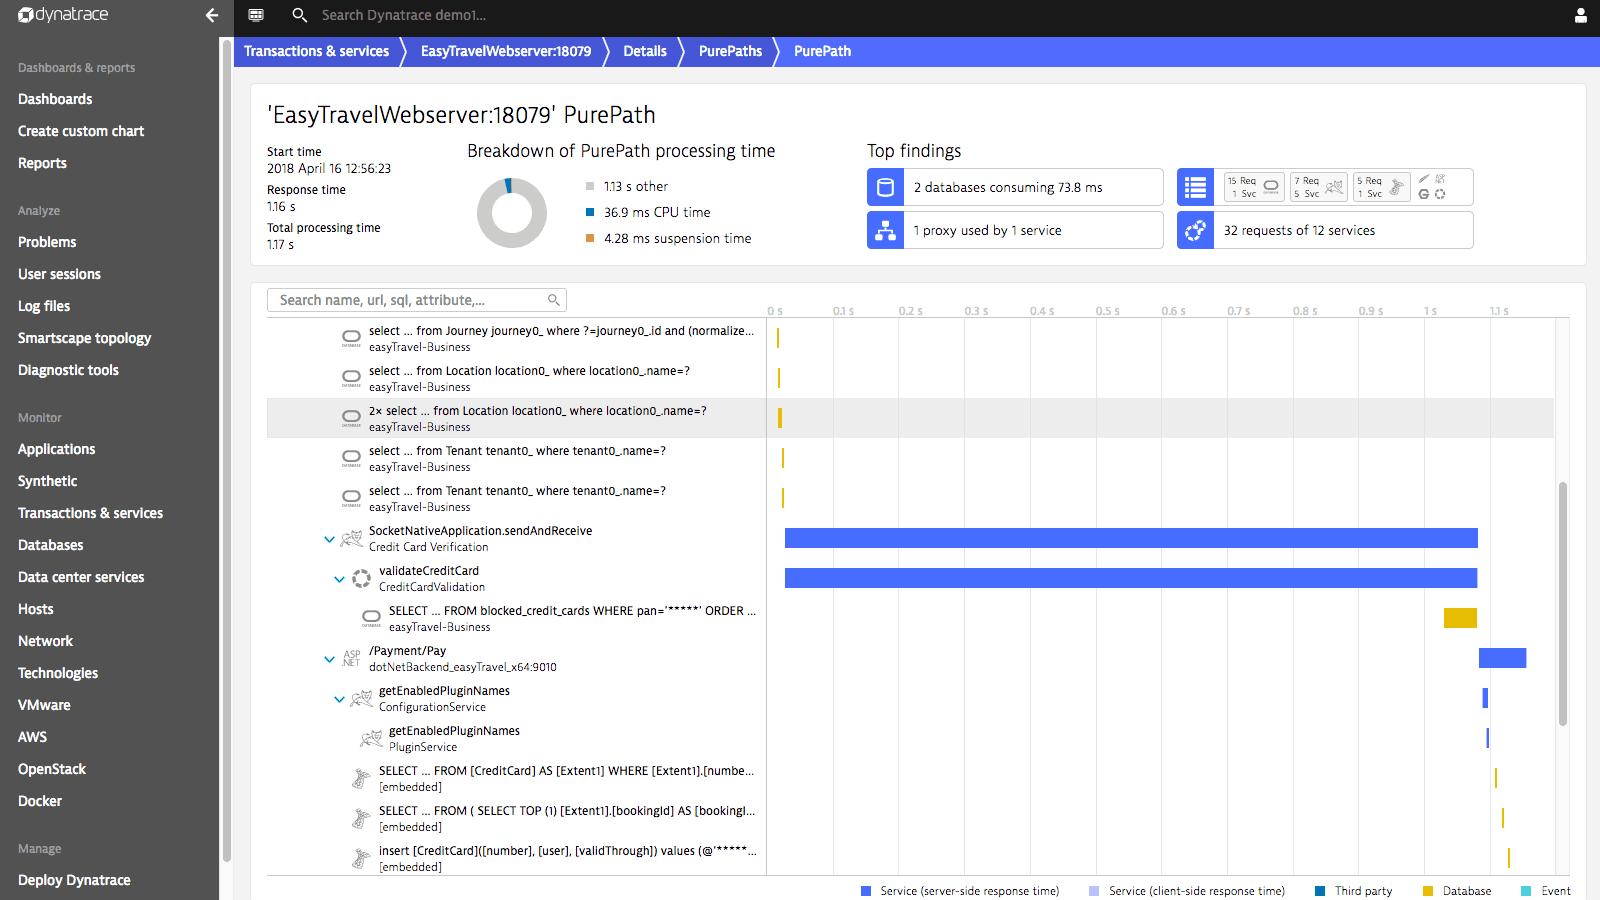 Dynatrace Screenshot